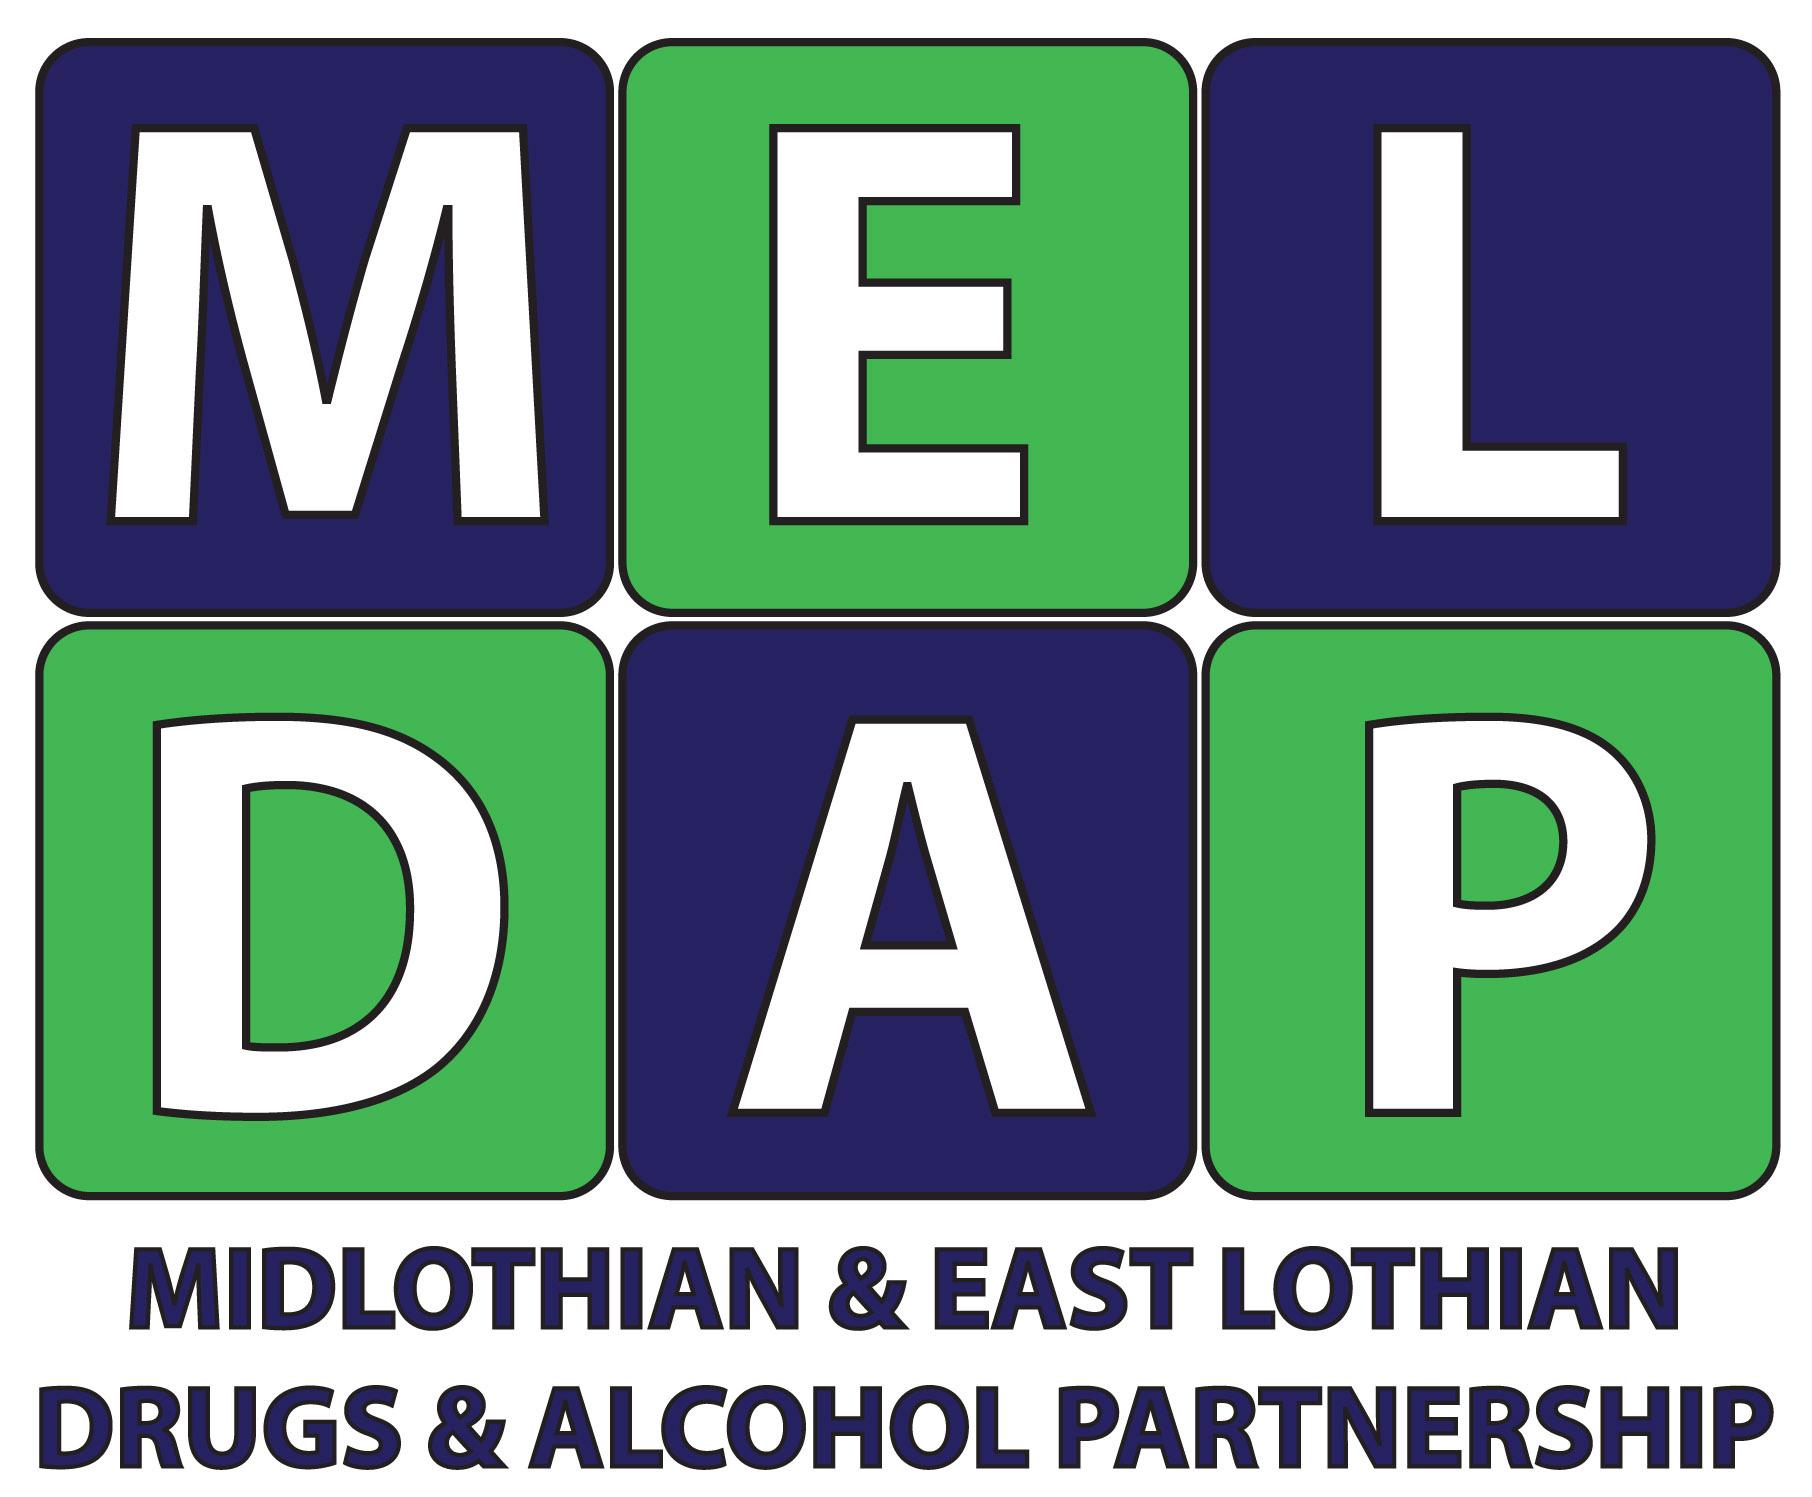 Midlothian and East Lothian Drugs & Alcohol Partnership